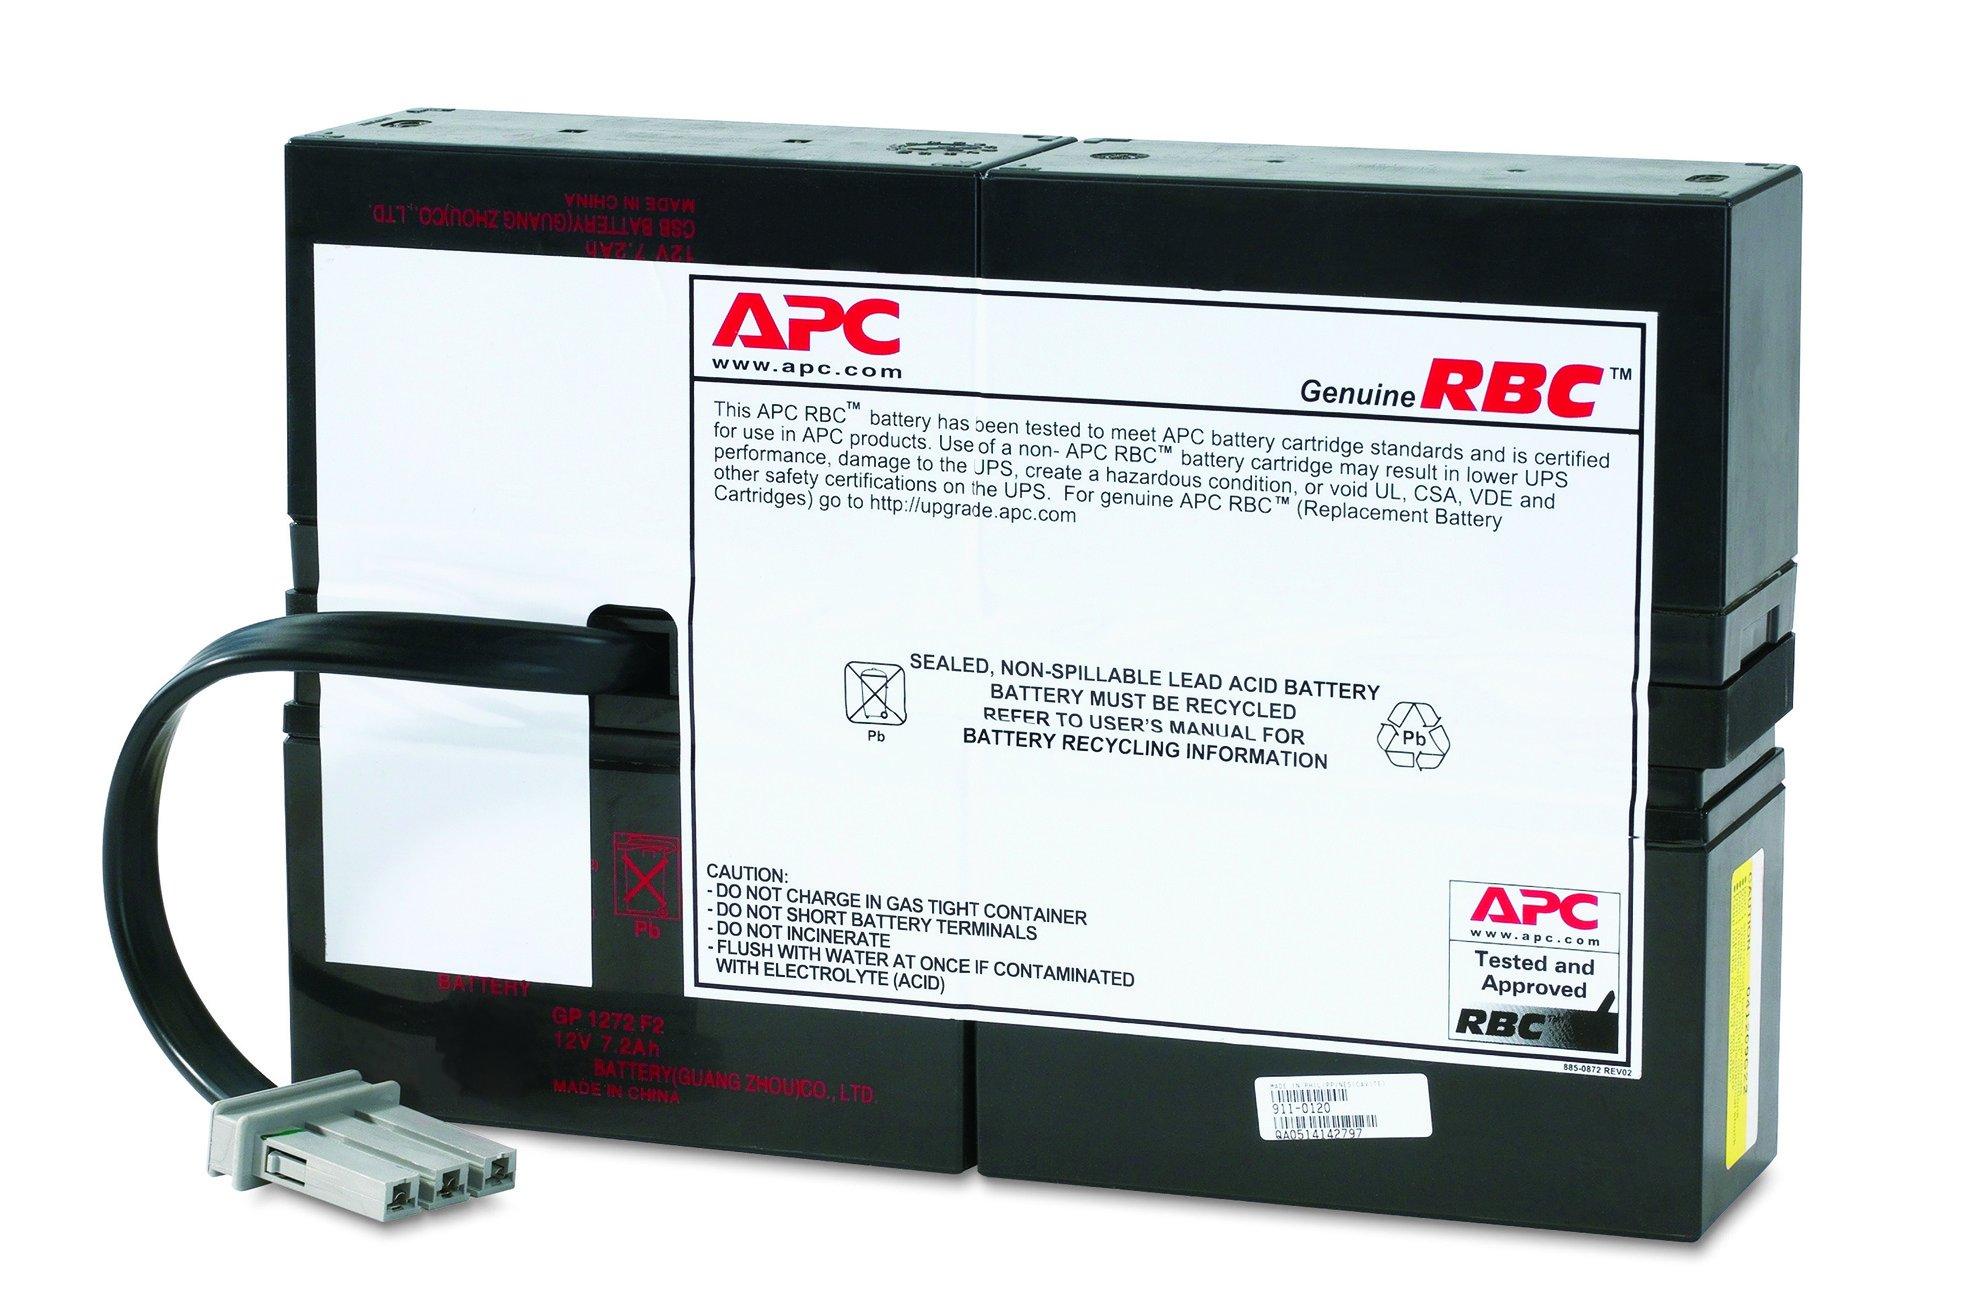 Apc 1500 Battery Wiring Diagram | Wiring Diagram Apc Ups Battery Wiring Diagram on wiring diagram power supplies, wiring diagram software, wiring diagram battery,